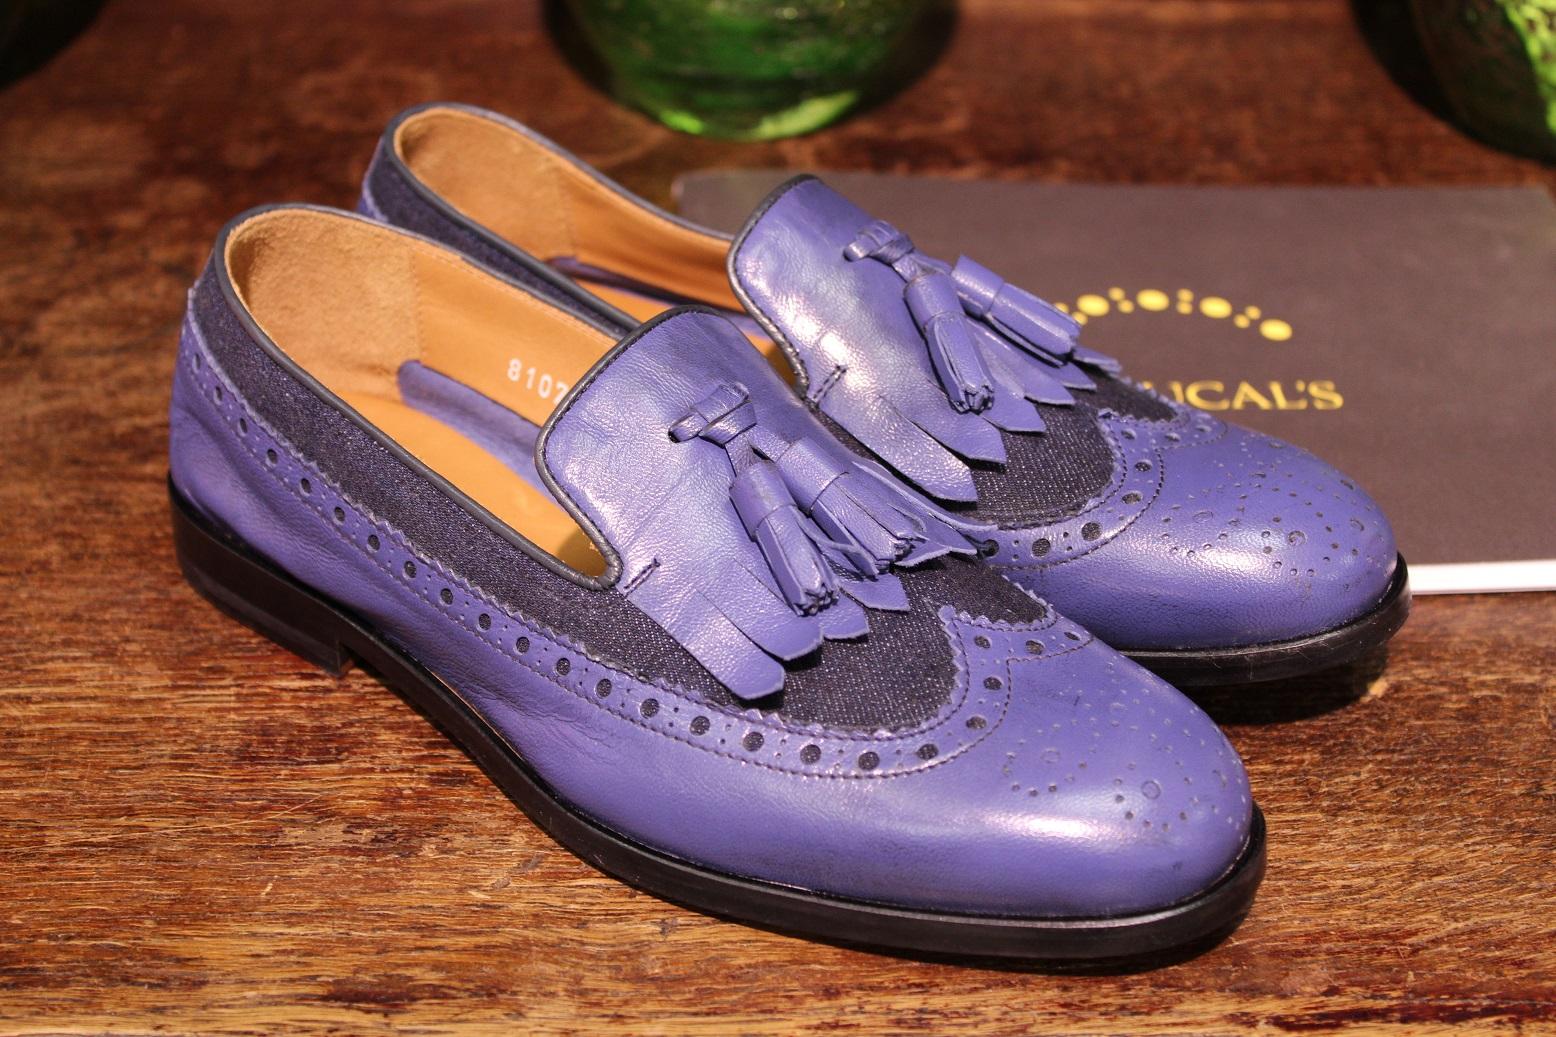 gallery_1_anglijskaja-jelegantnost-i-italjanskij-komfort-jekskljuzivnoj-obuvi-doucals